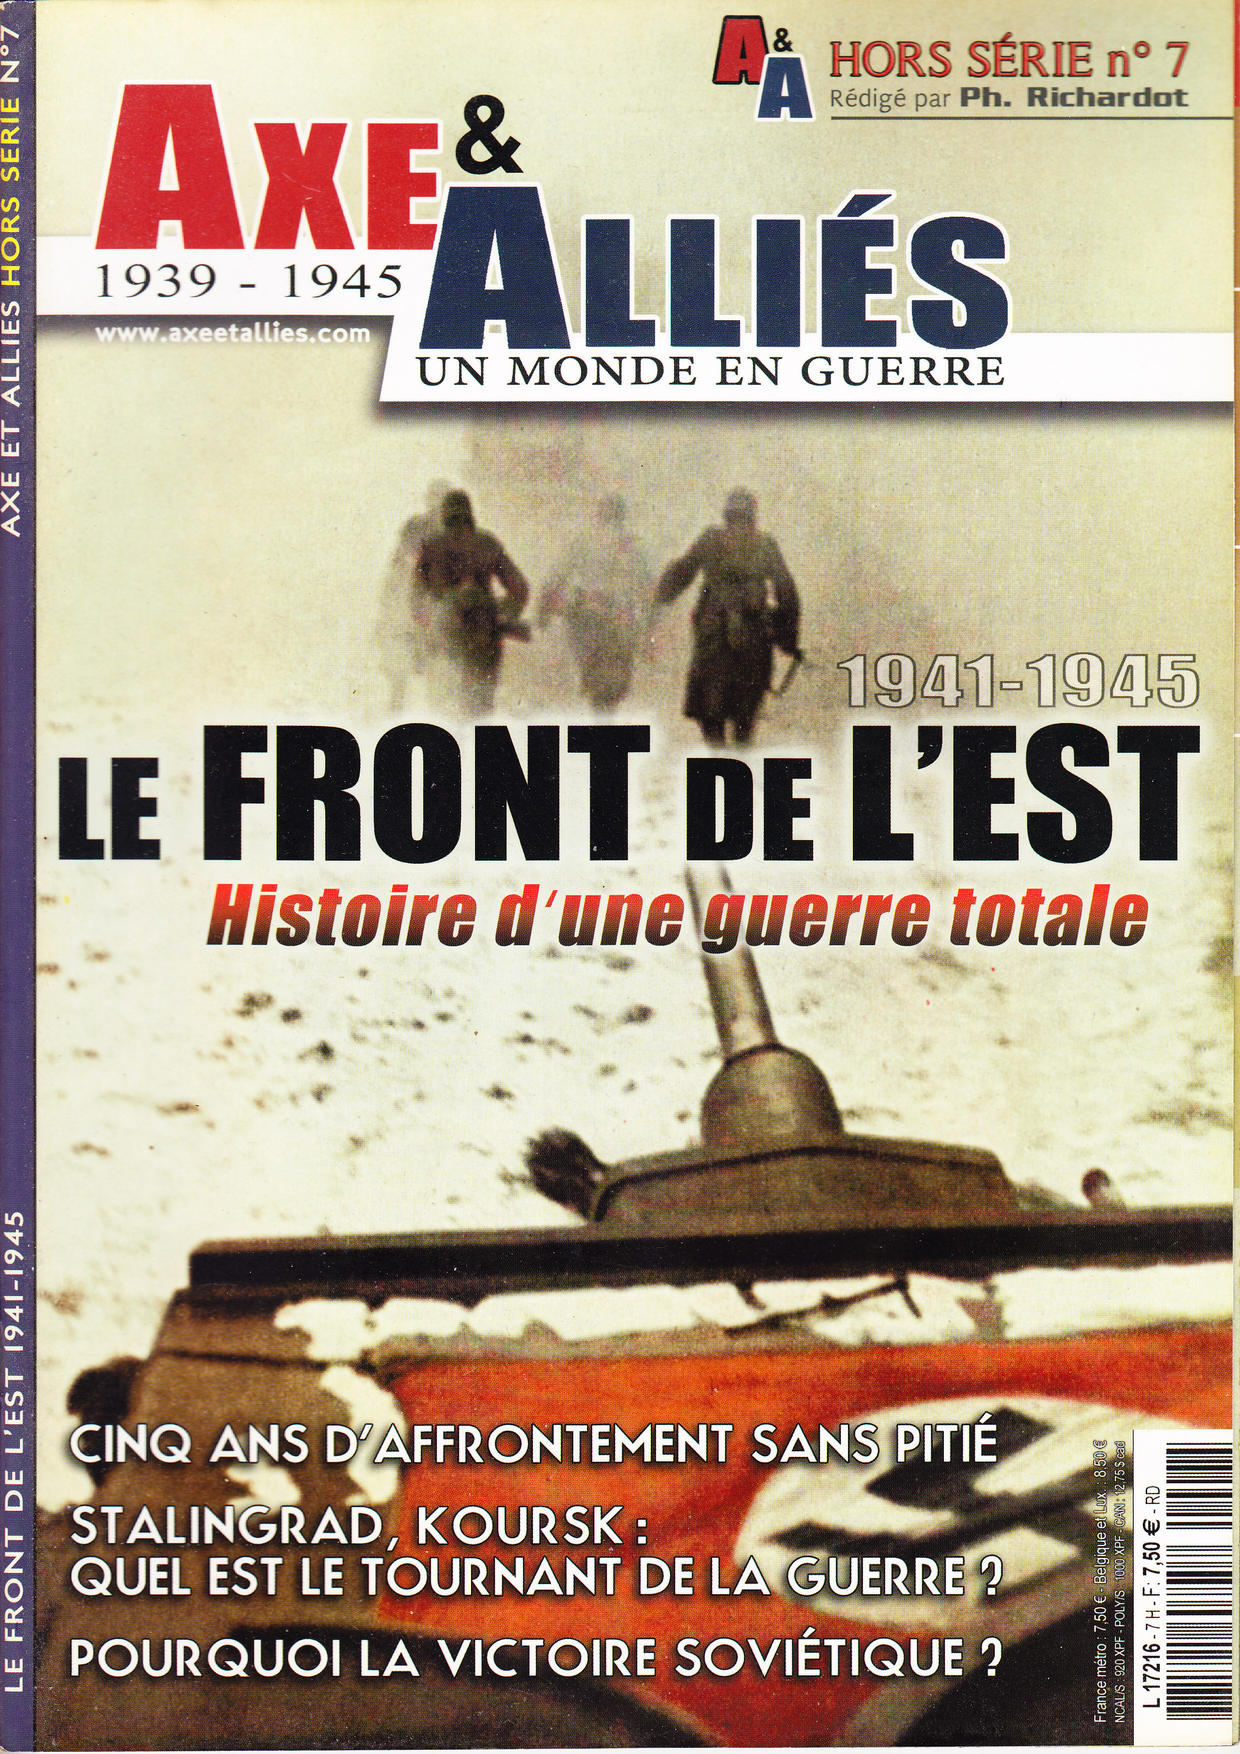 Axe & Alliés - 1939 - 1945 - Hors série 07